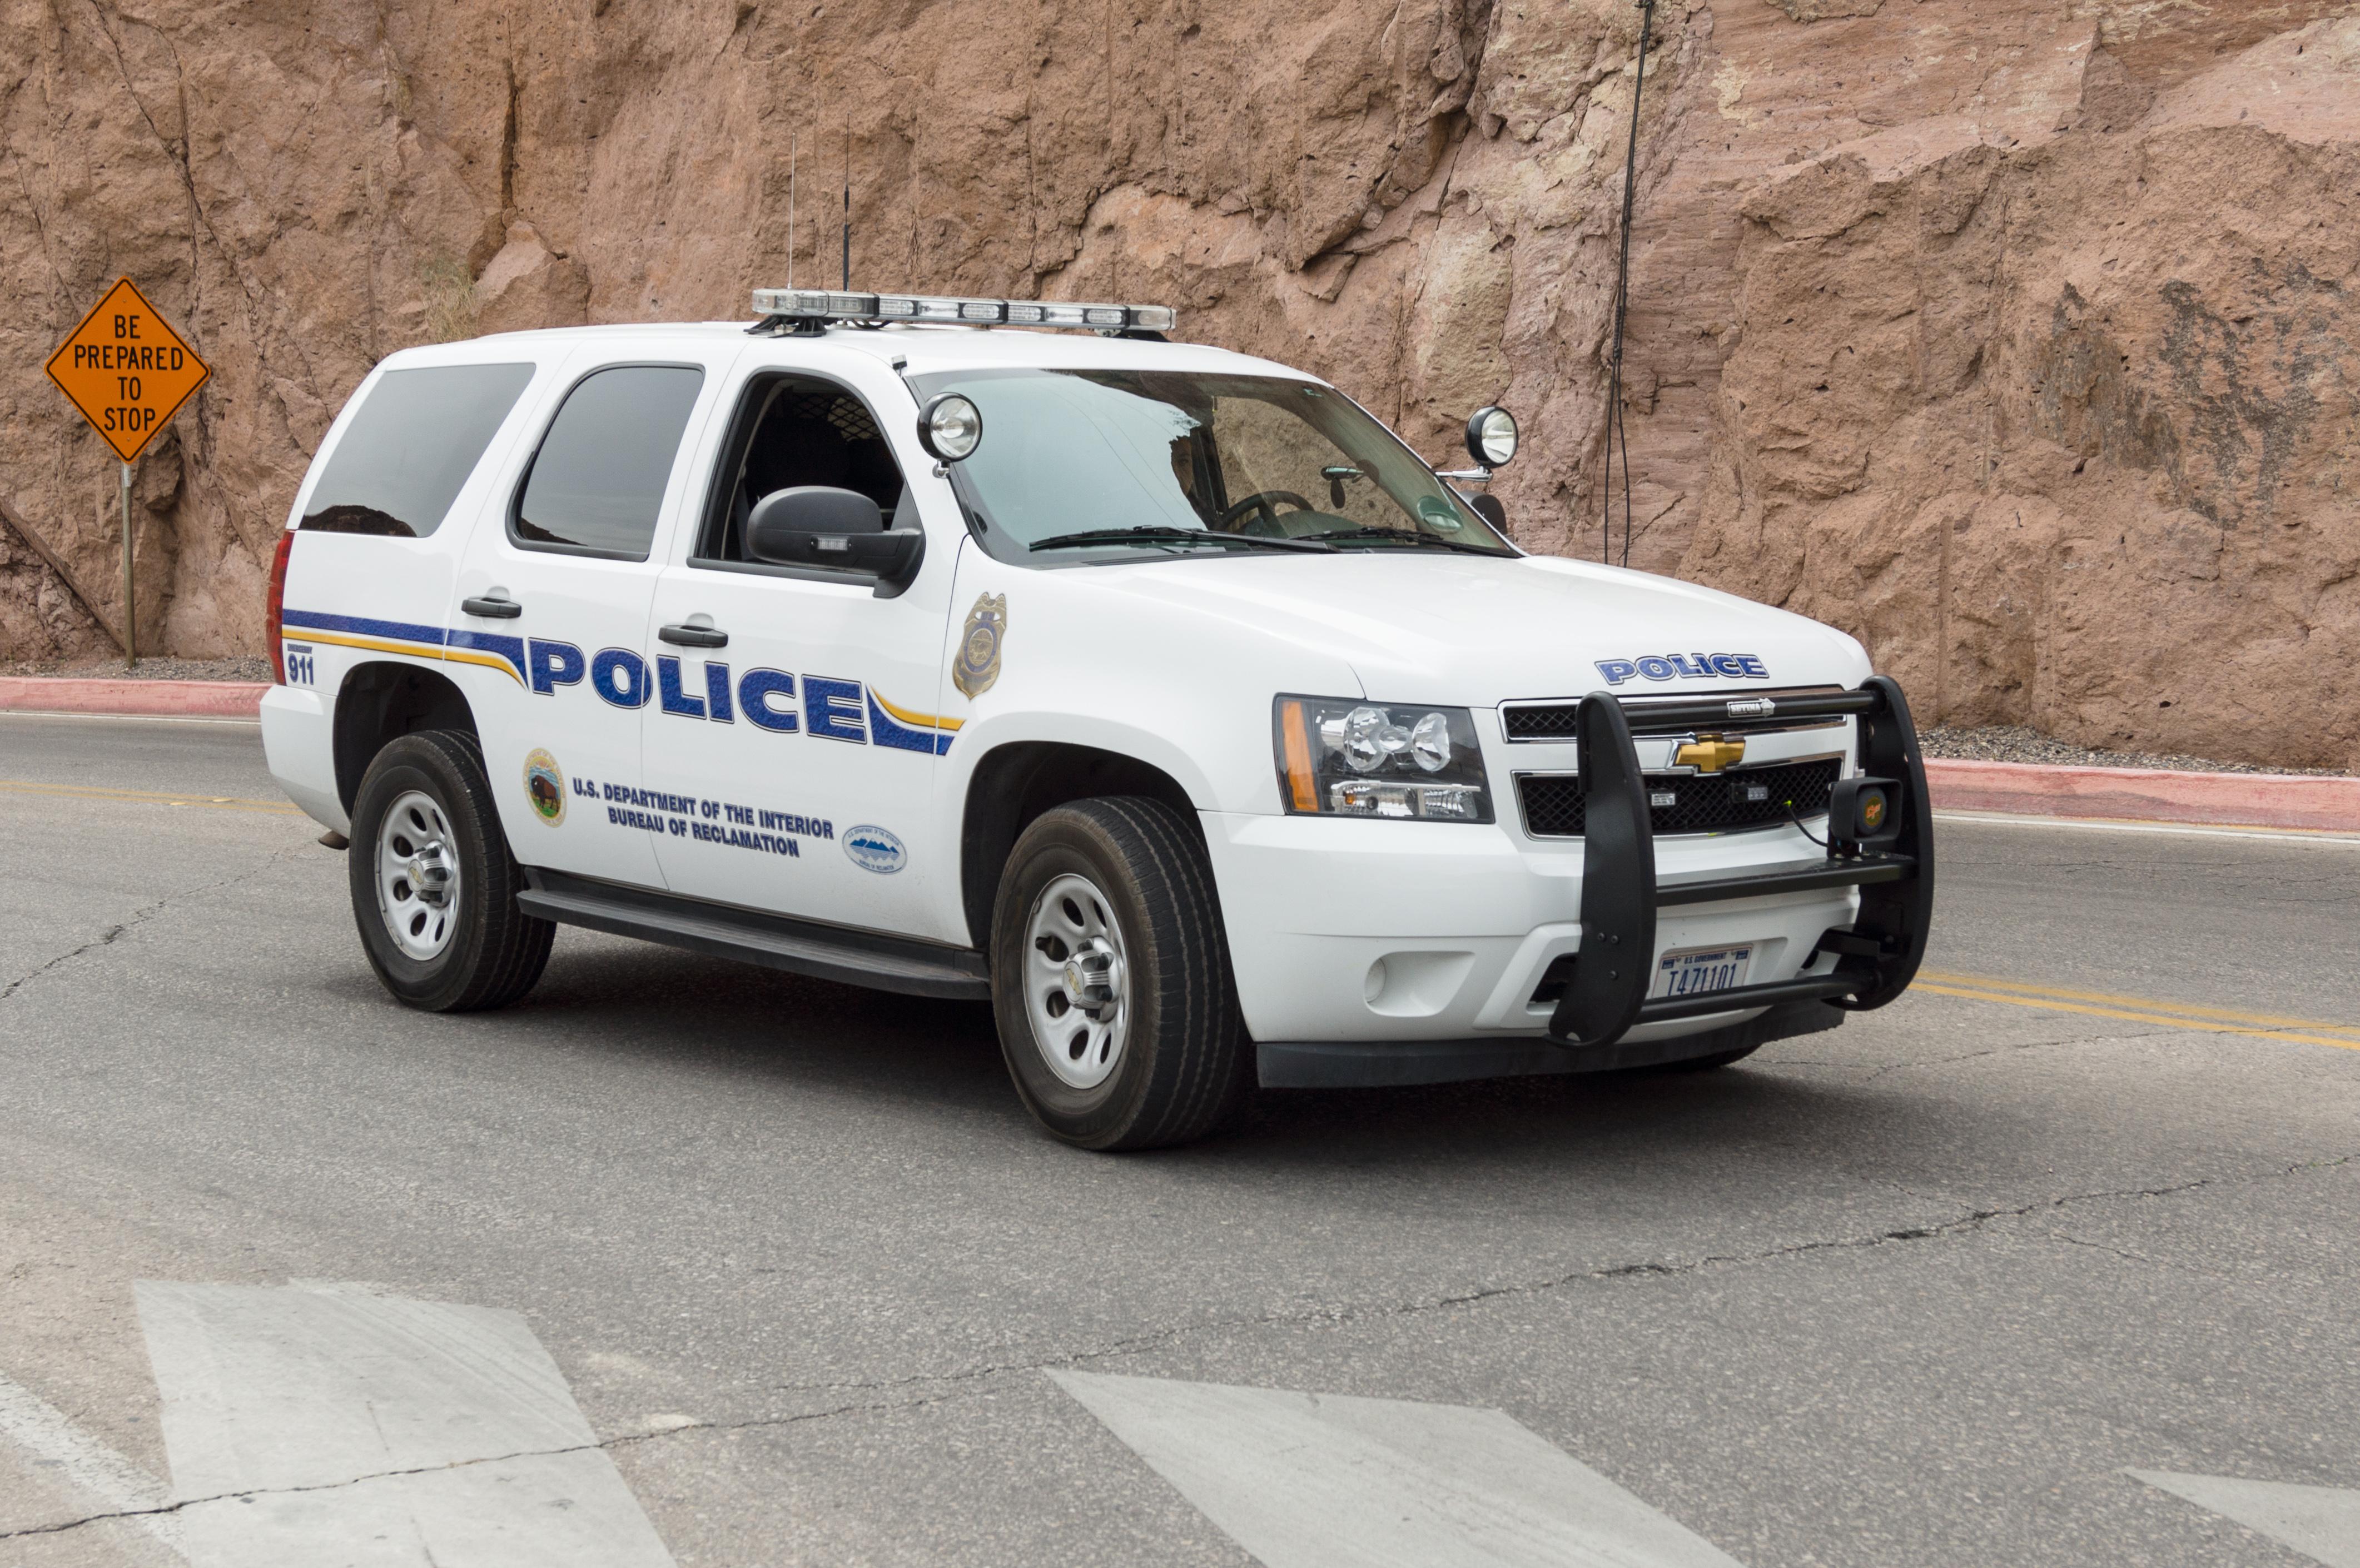 File:Hoover Dam, Police Chevrolet Tachoe.jpg - Wikimedia Commons